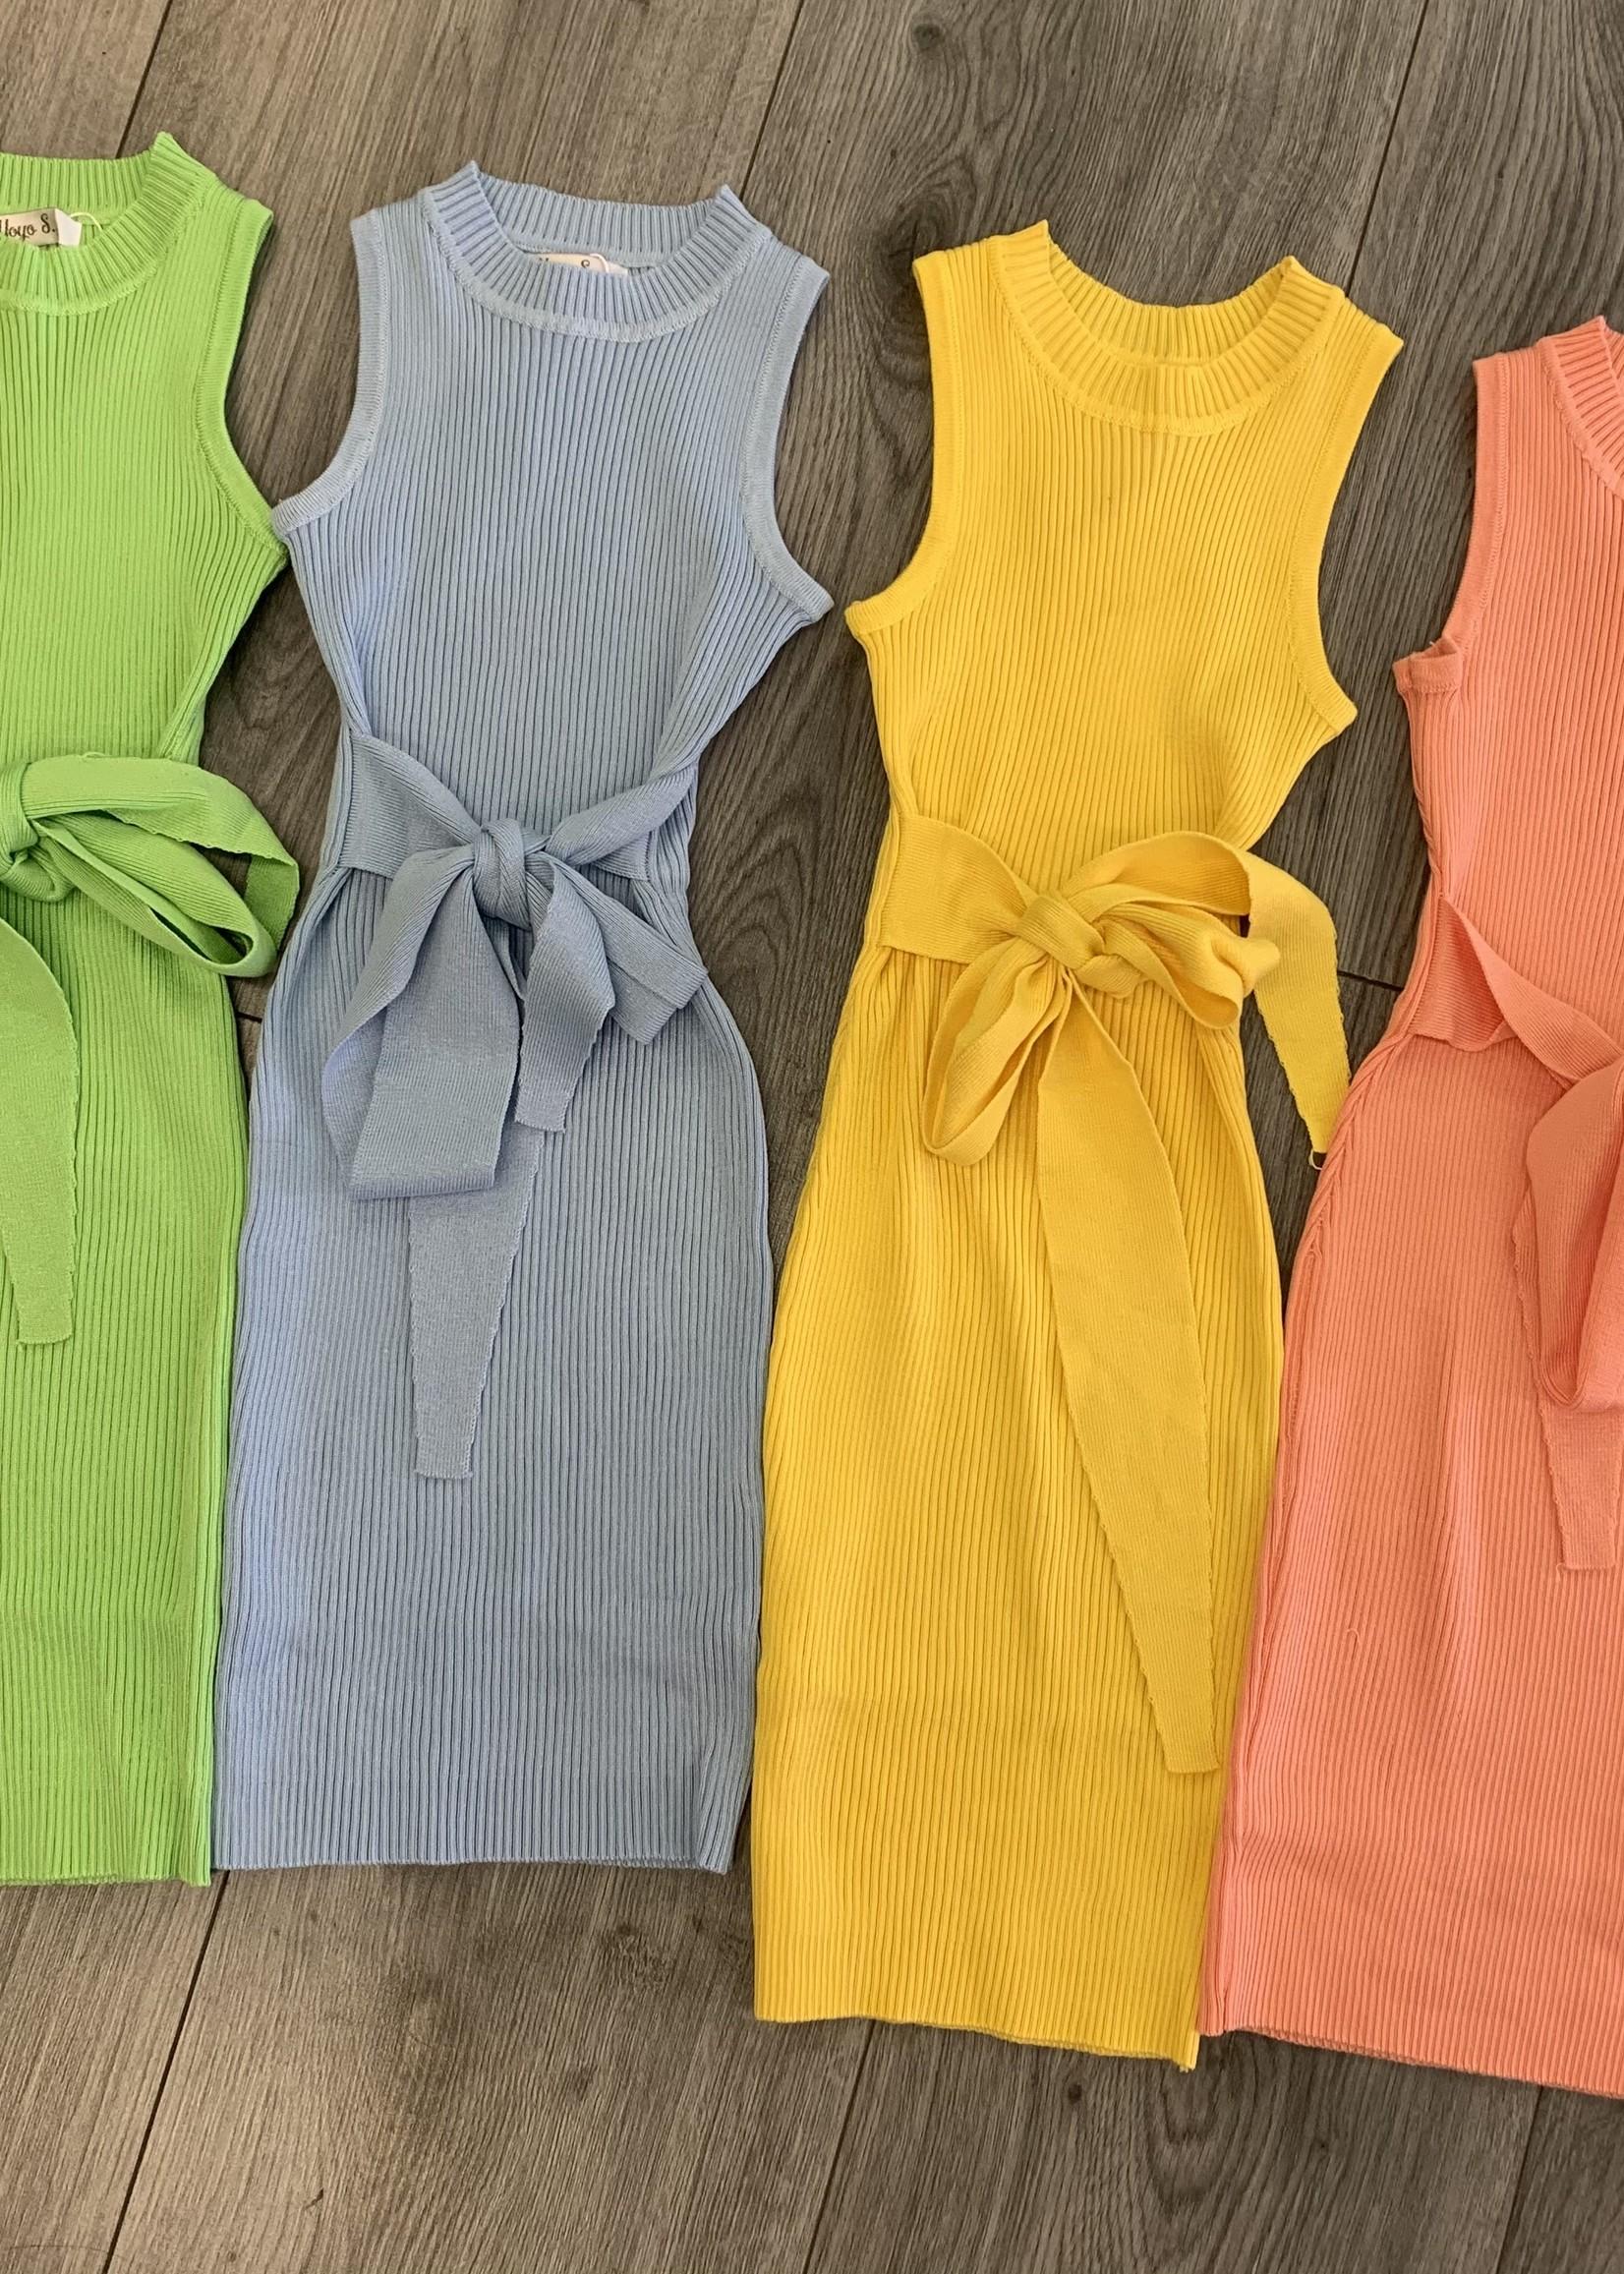 Divanis Divanis knoop jurk oranje